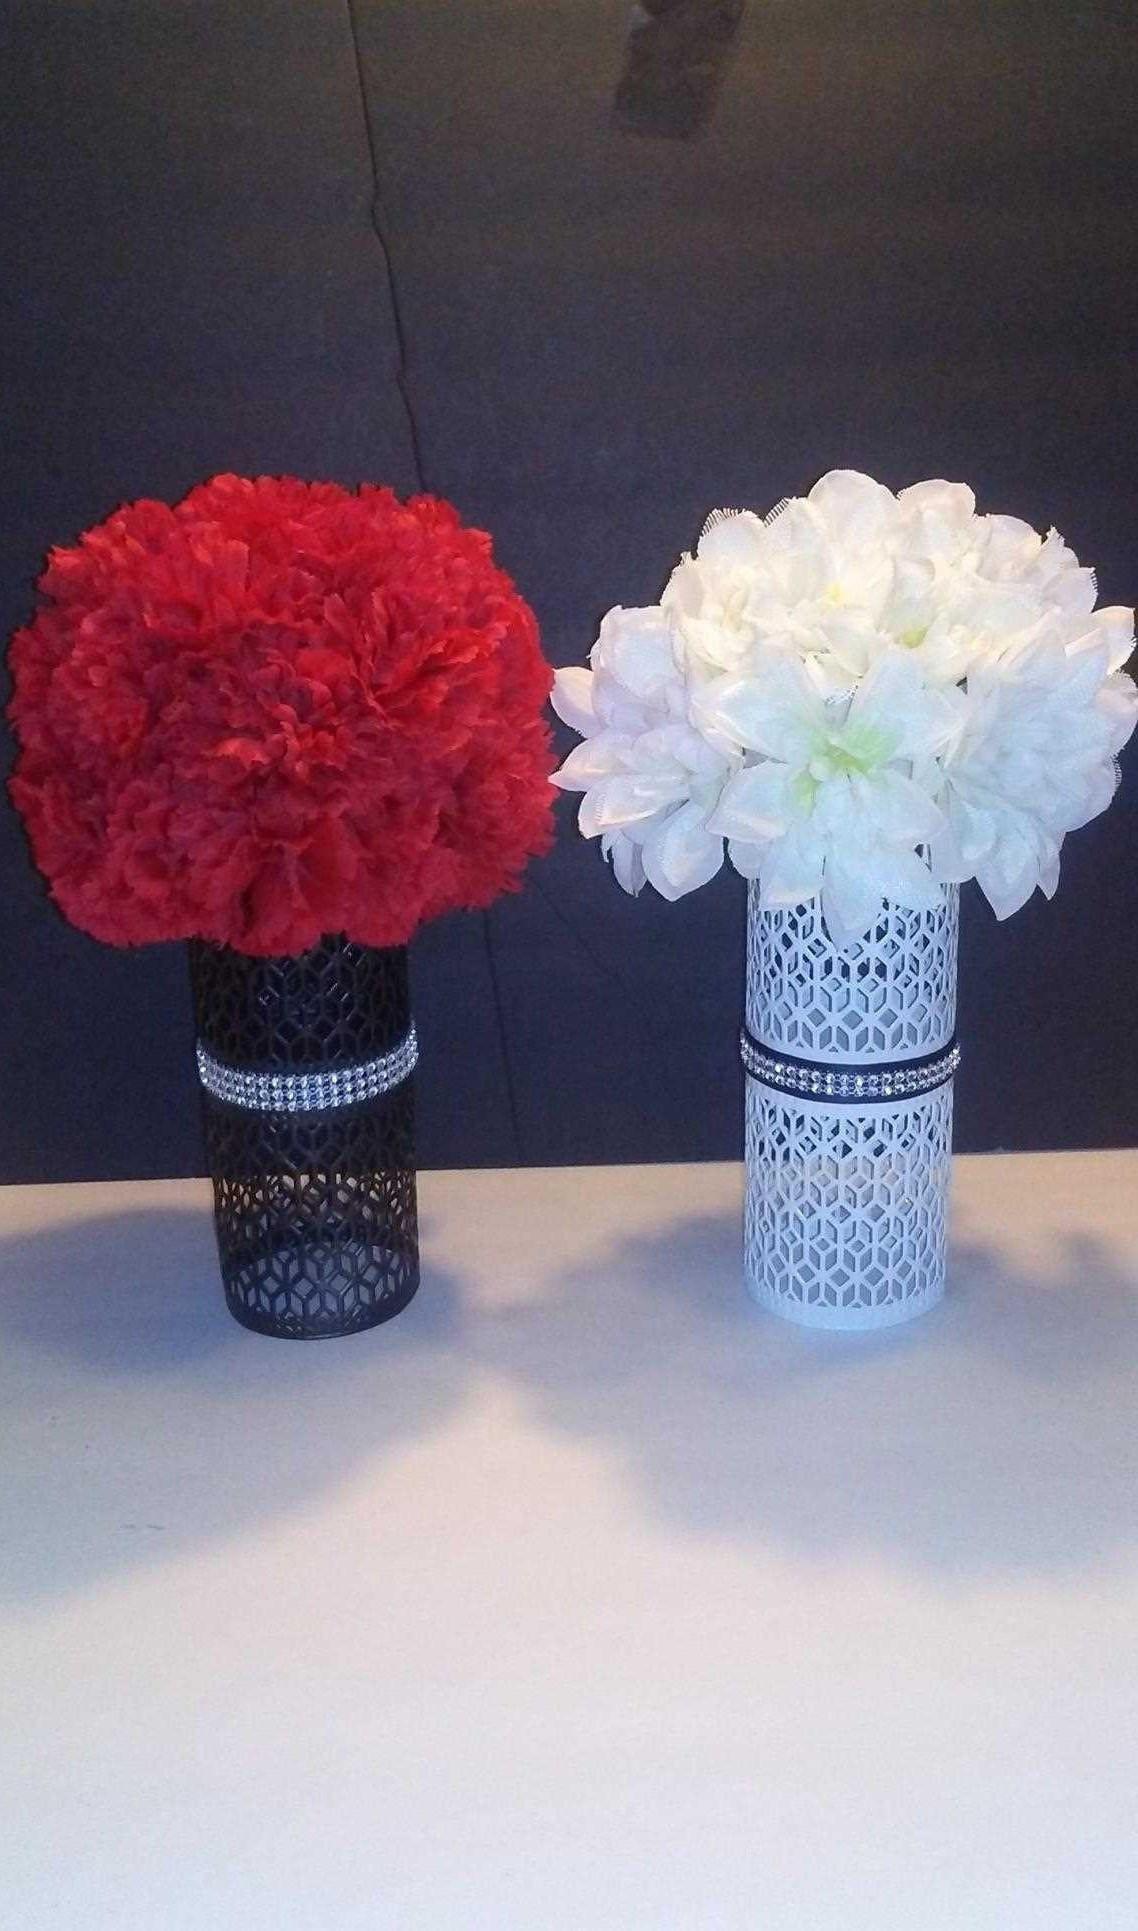 20 Great Glass Vase Decorations Centerpieces